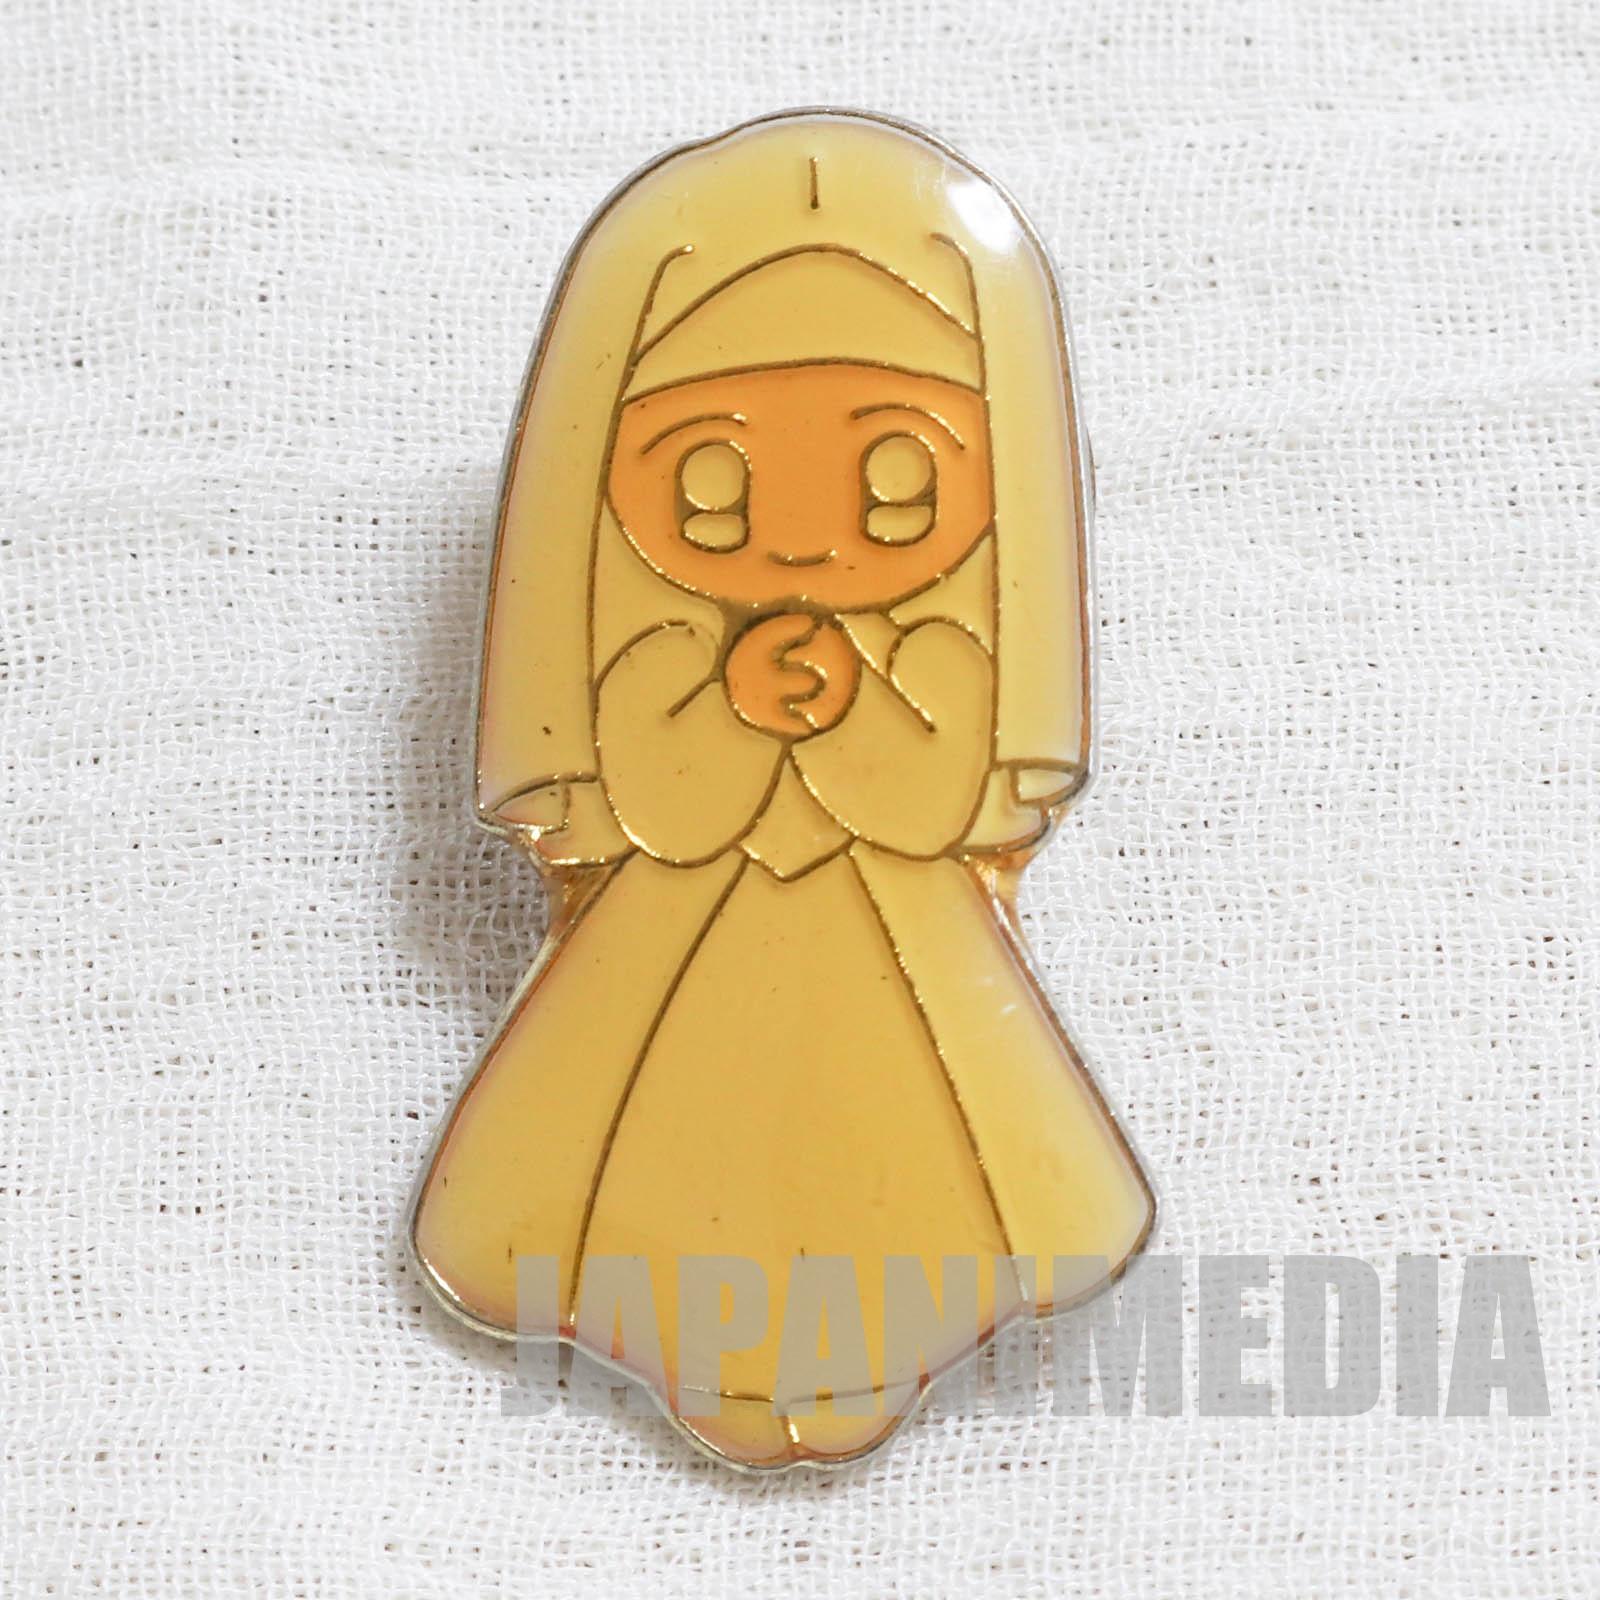 Saint Tail Seira Mimori Saint Tail Collection Pins JAPAN ANIME